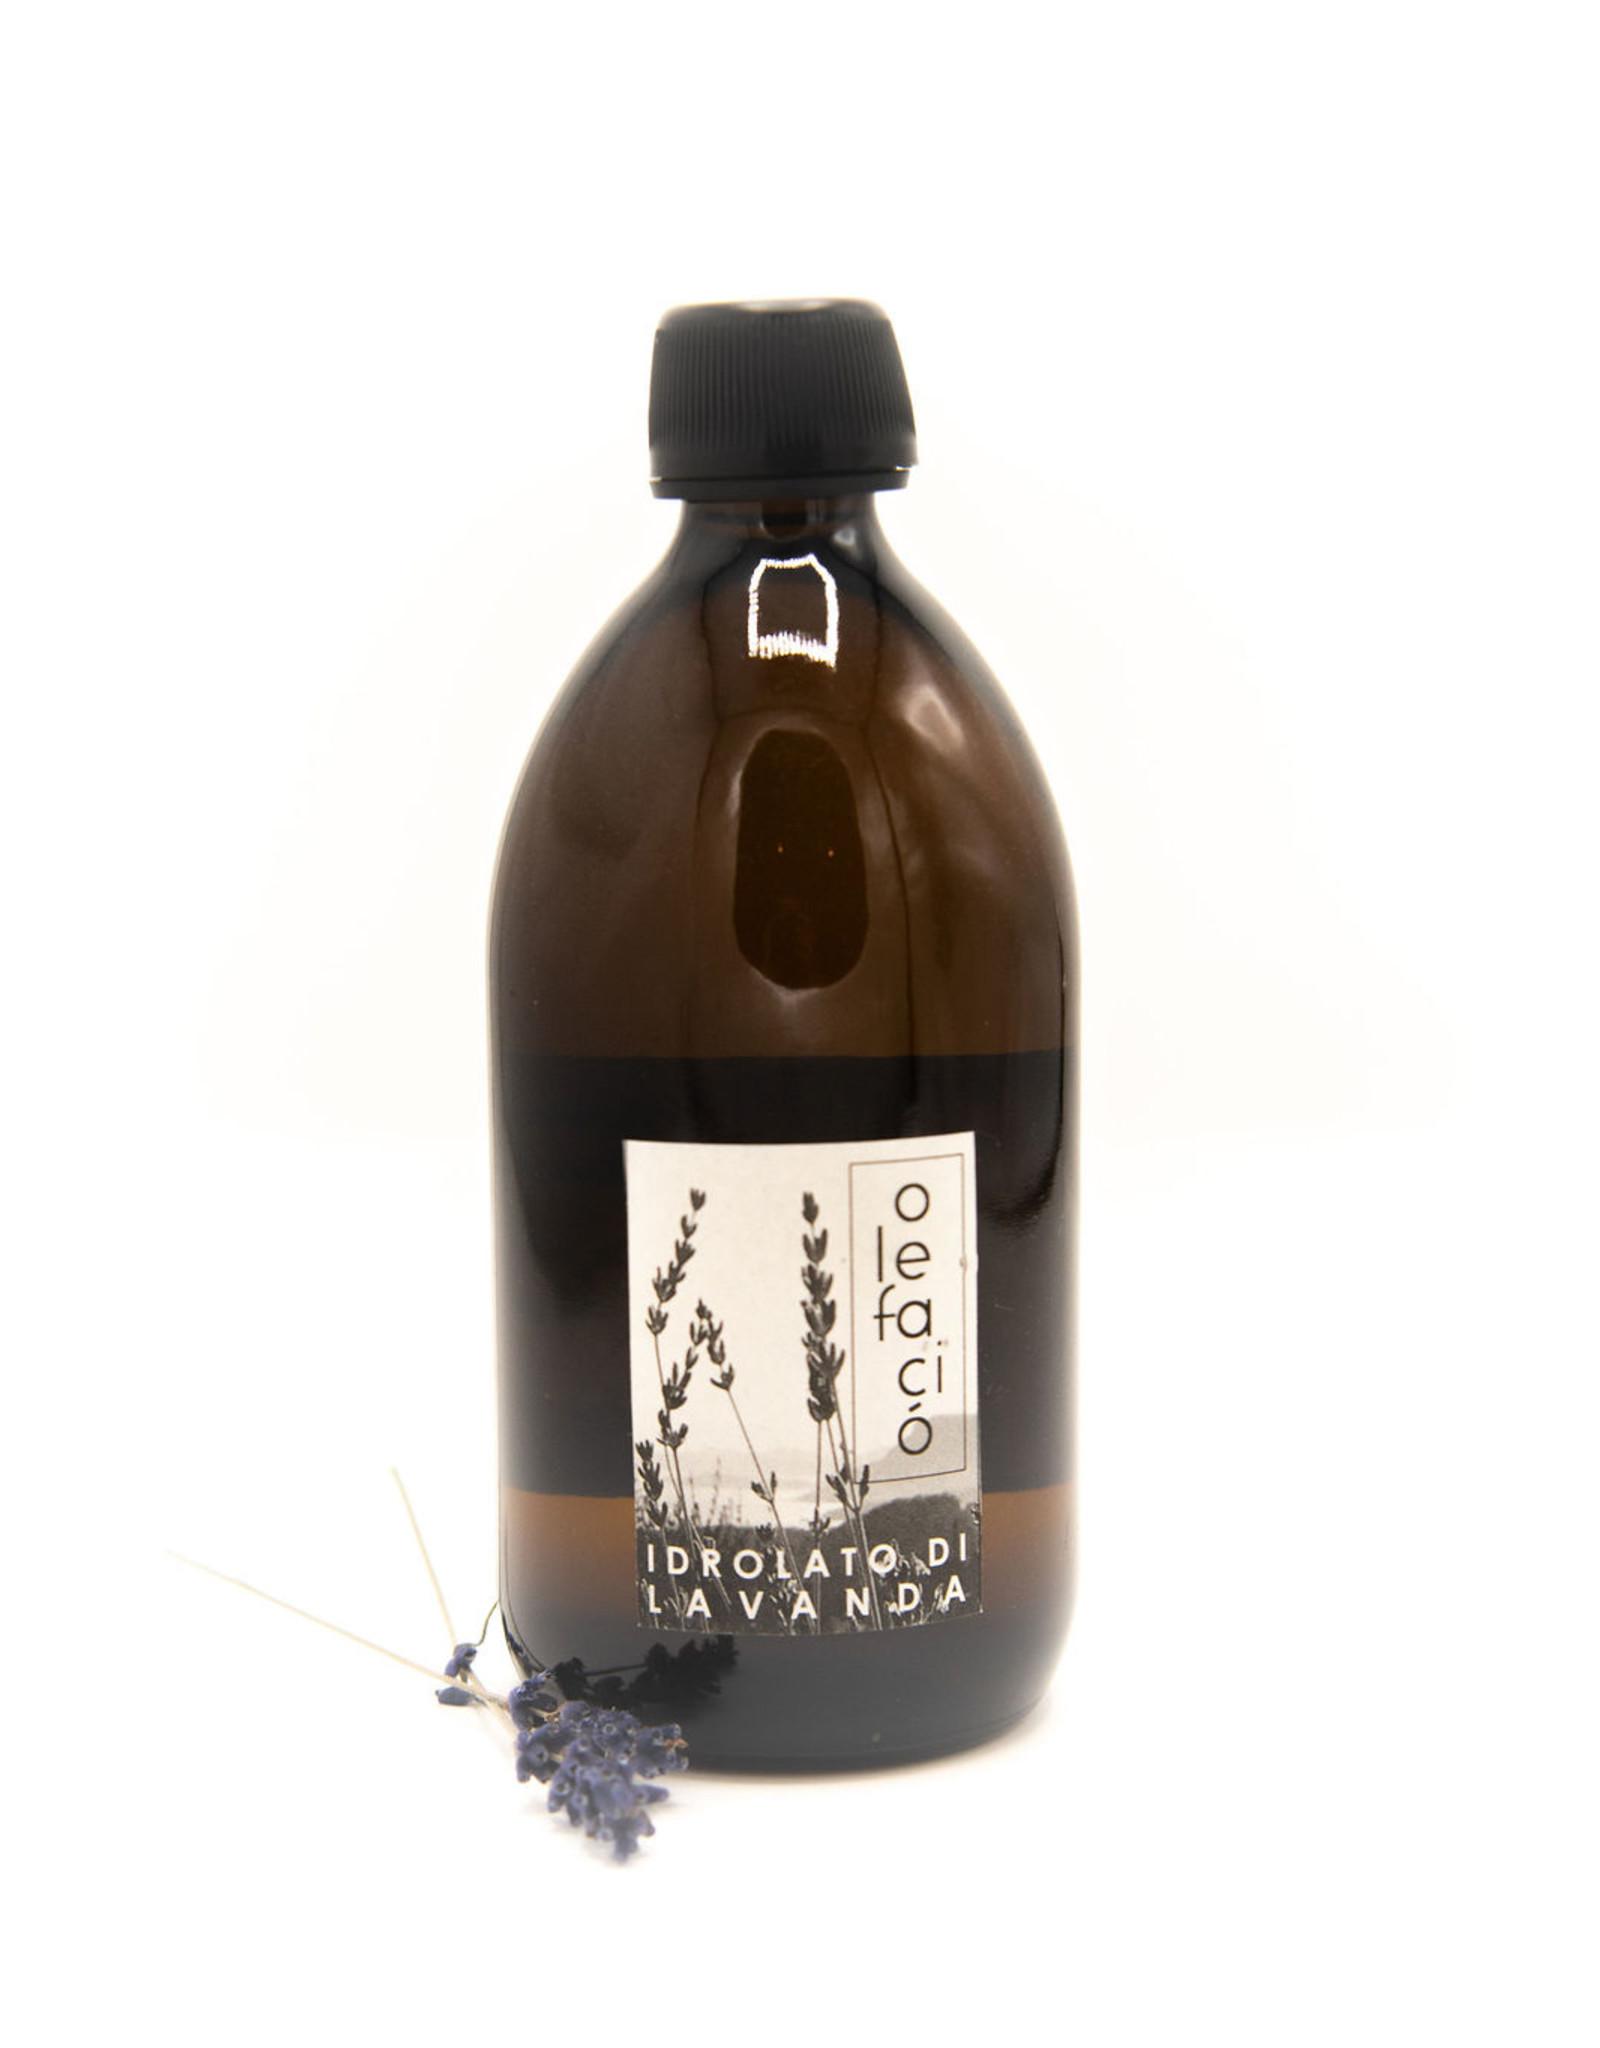 Lavendelhydrolaat refill